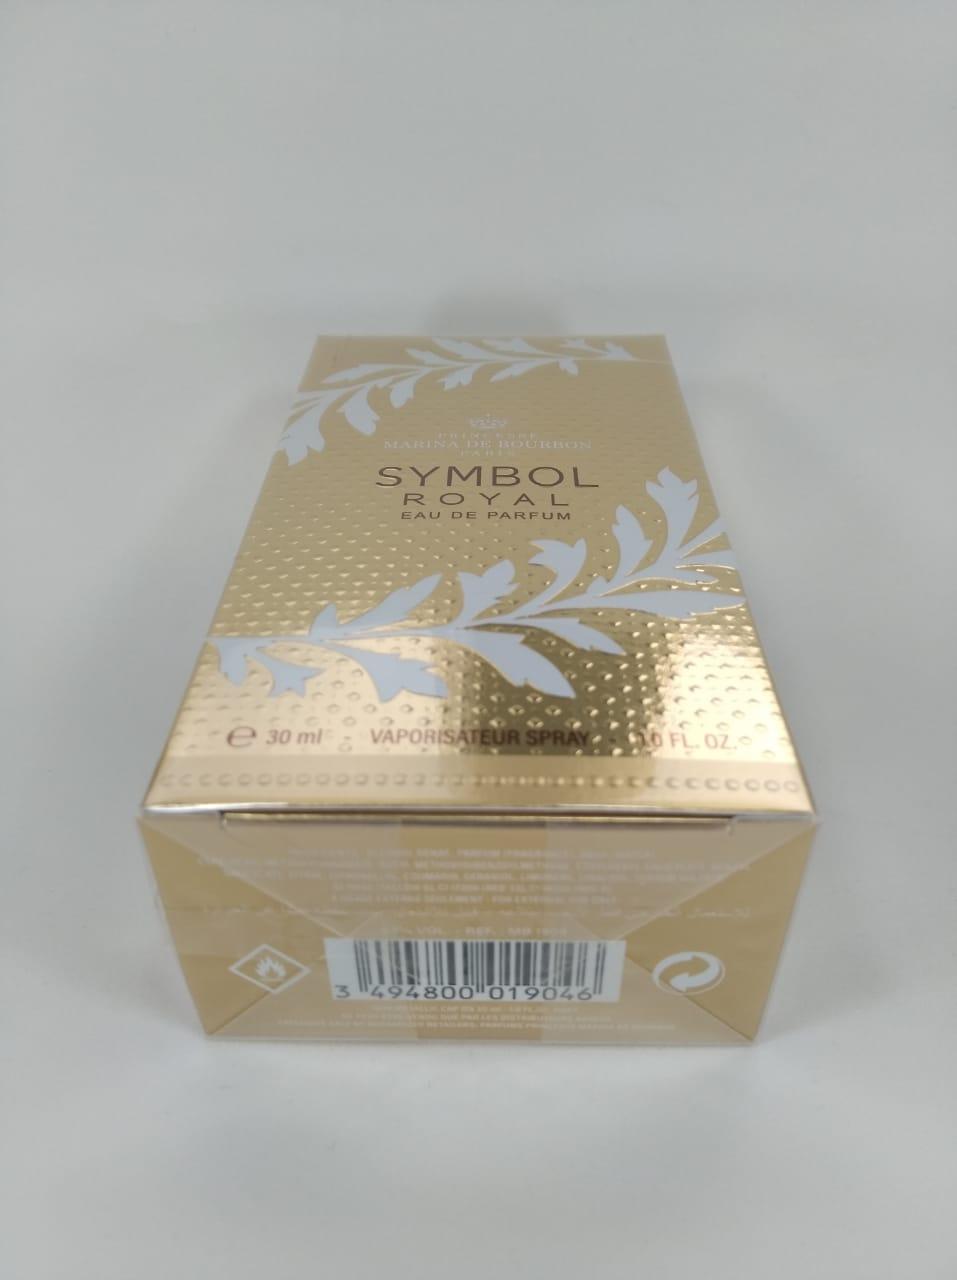 Symbol Royal Marina de Bourbon Eau de Parfum.